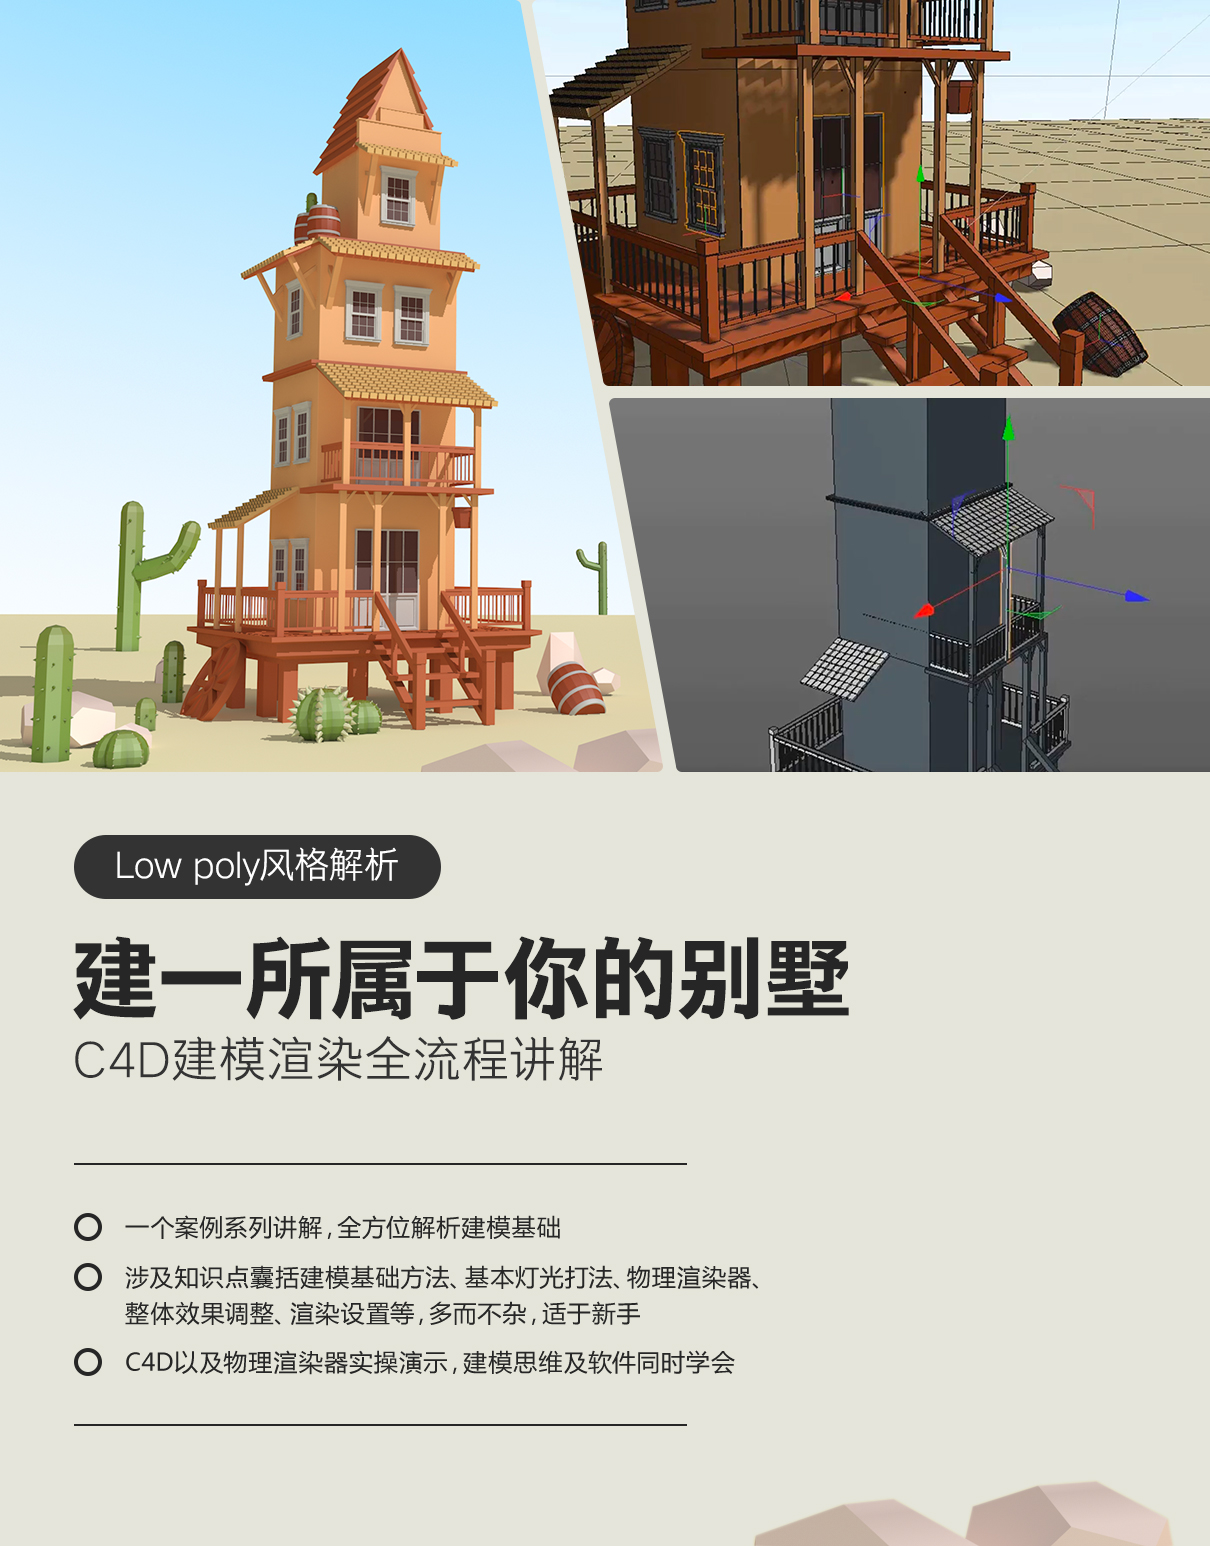 C4D-别墅-主图.jpg